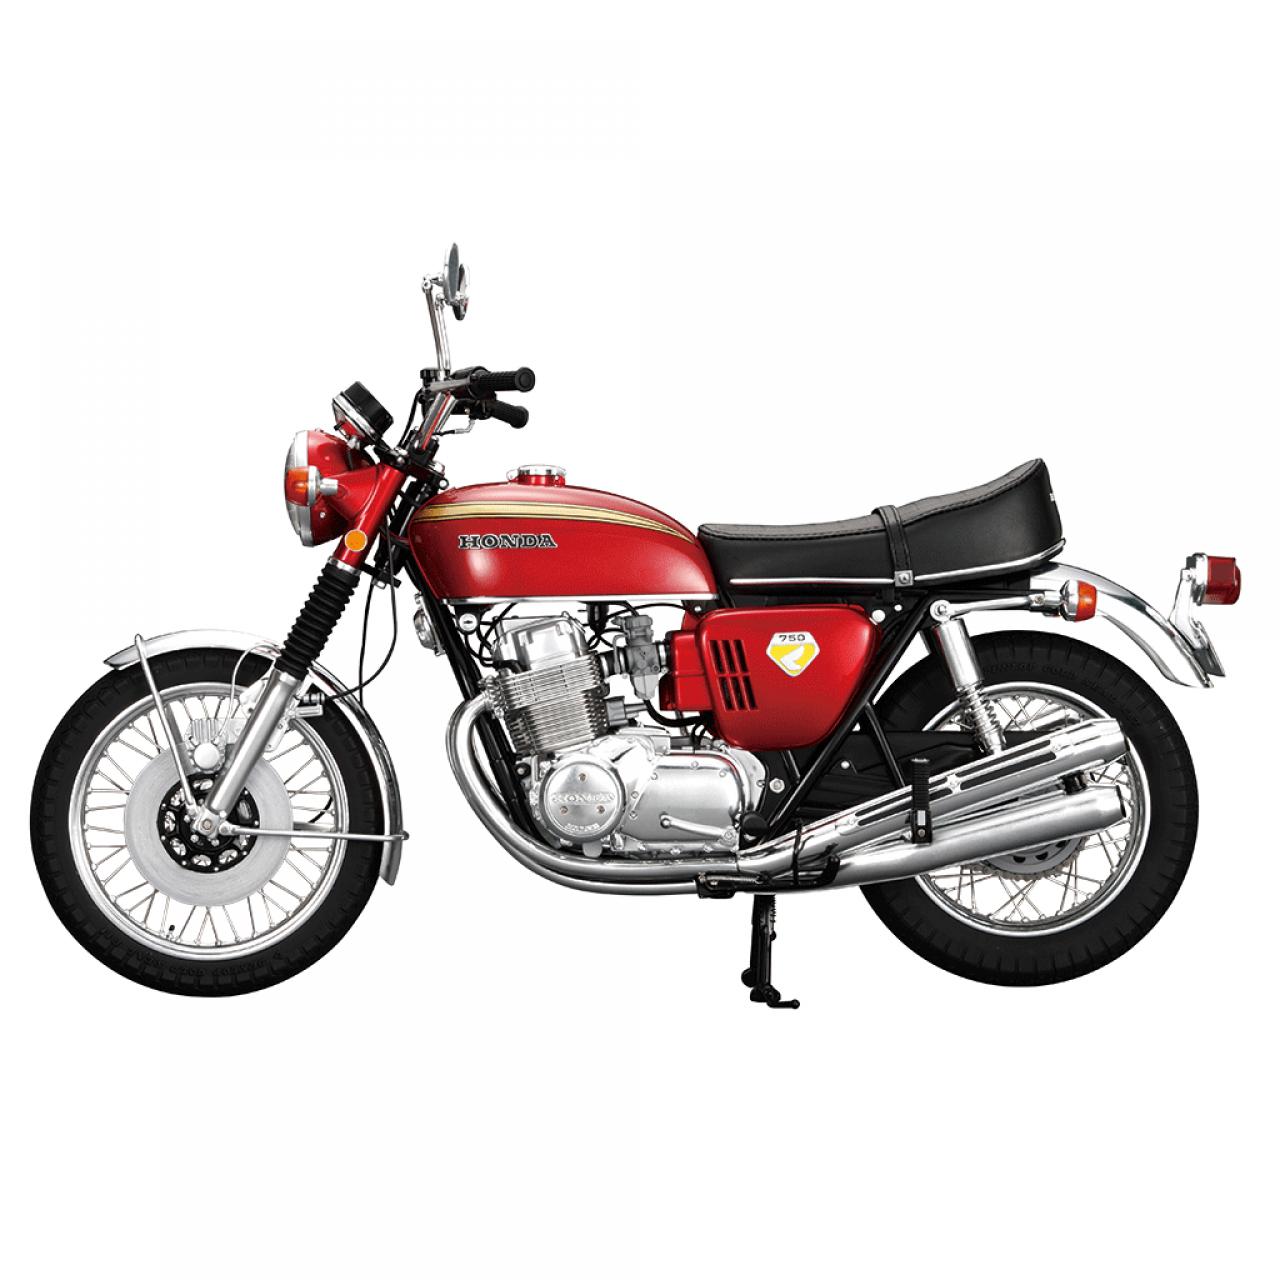 Honda Cb750 Motorcycle Model 14 Scale Modelspace